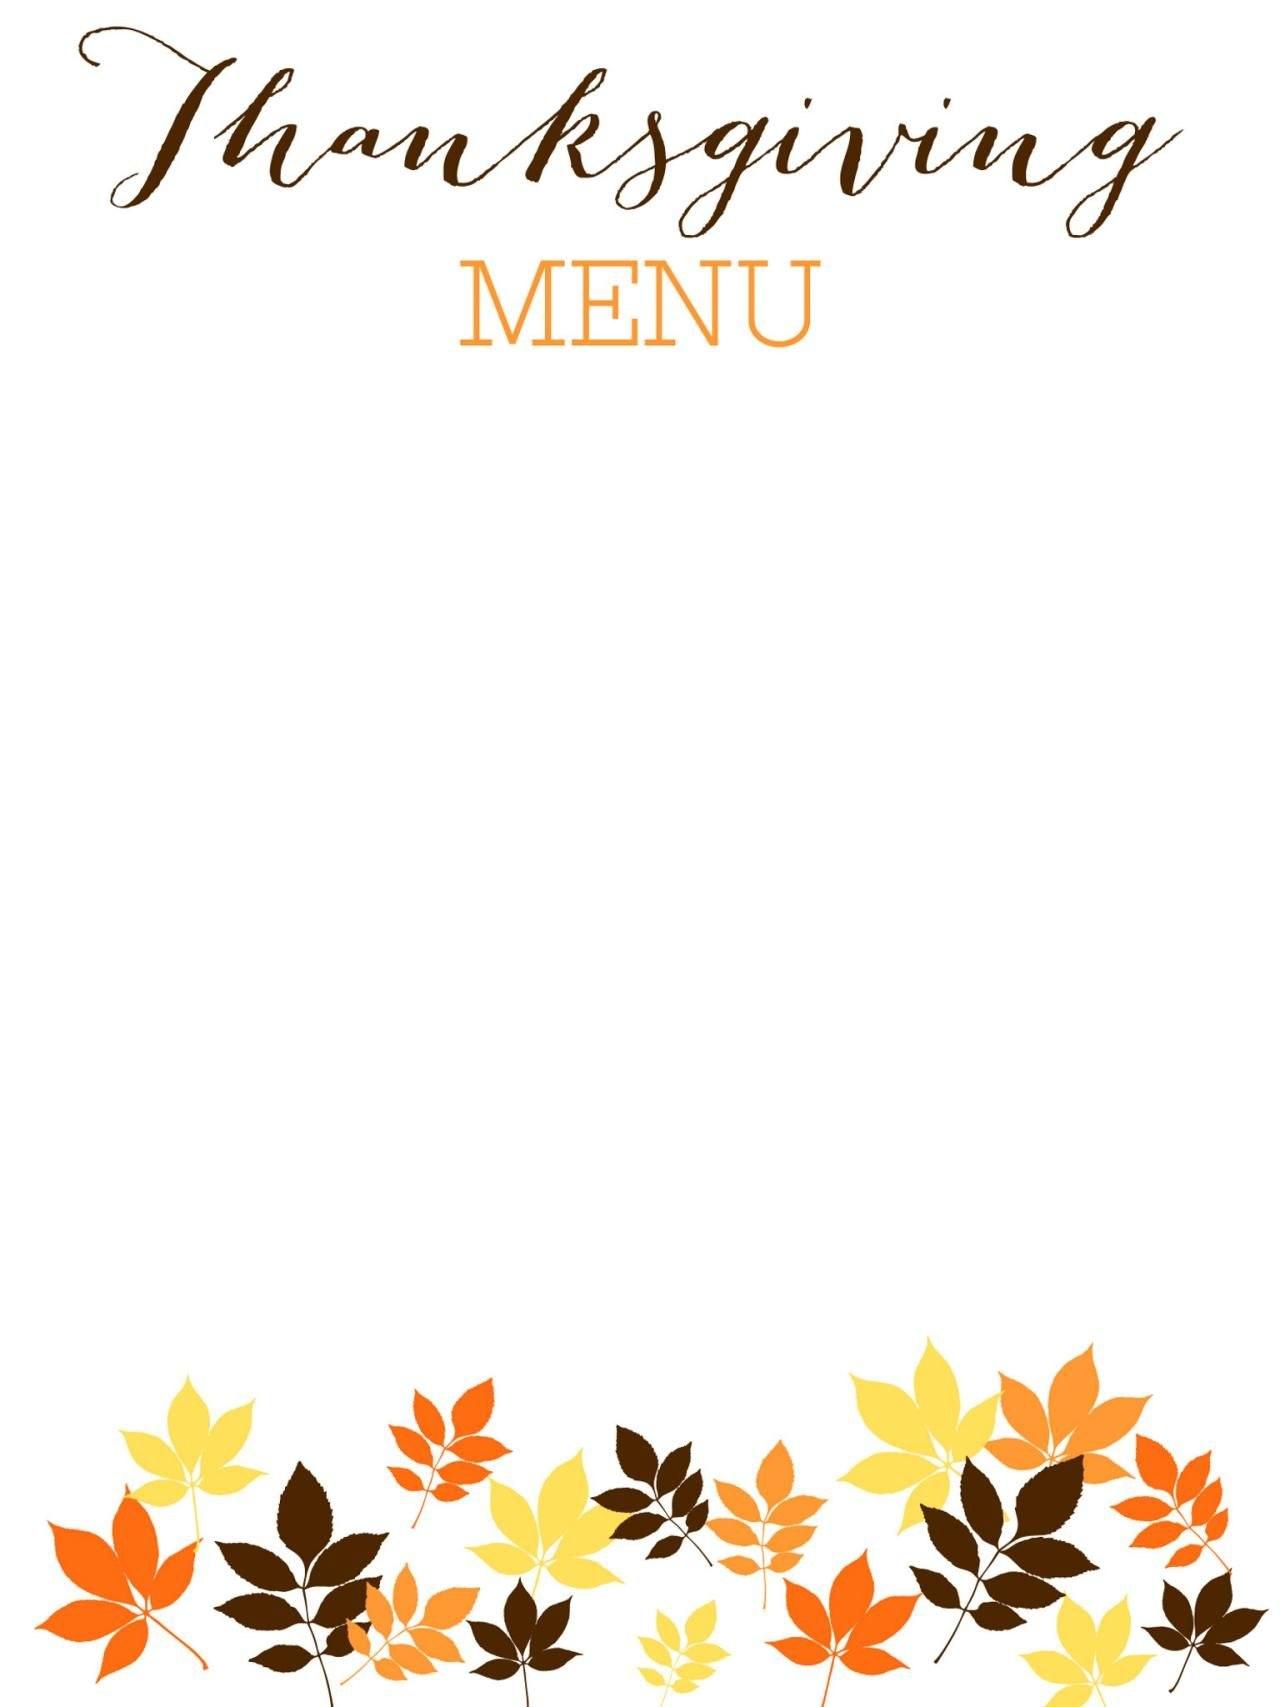 Printable And Free Thanksgiving Templates  Examen Final Pertaining To Thanksgiving Menu Template Printable